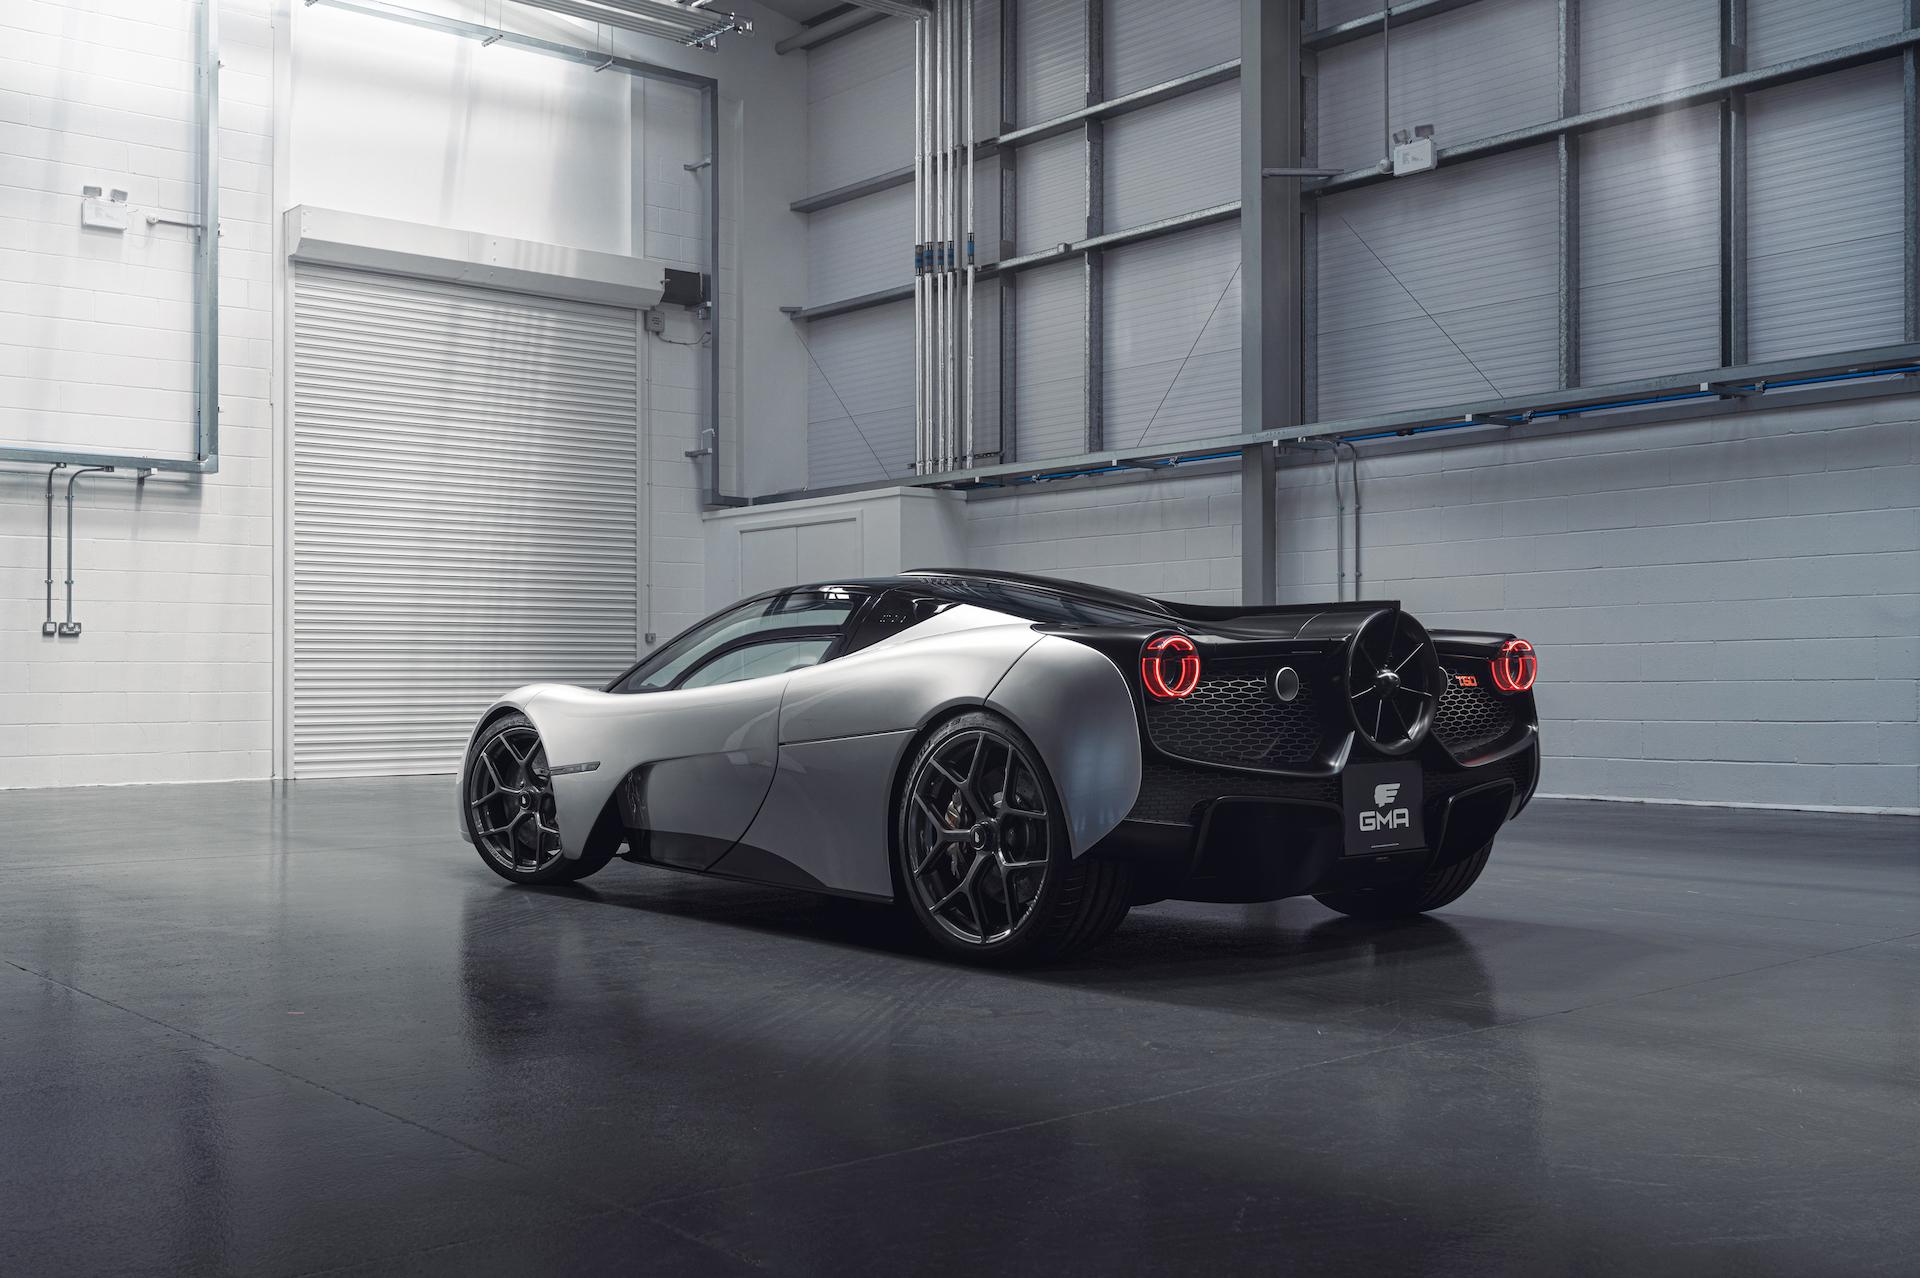 Gordon Murray's F1 successor, 2021 Ford F-150 Raptor, 2022 Infiniti QX55: Car News Headlines